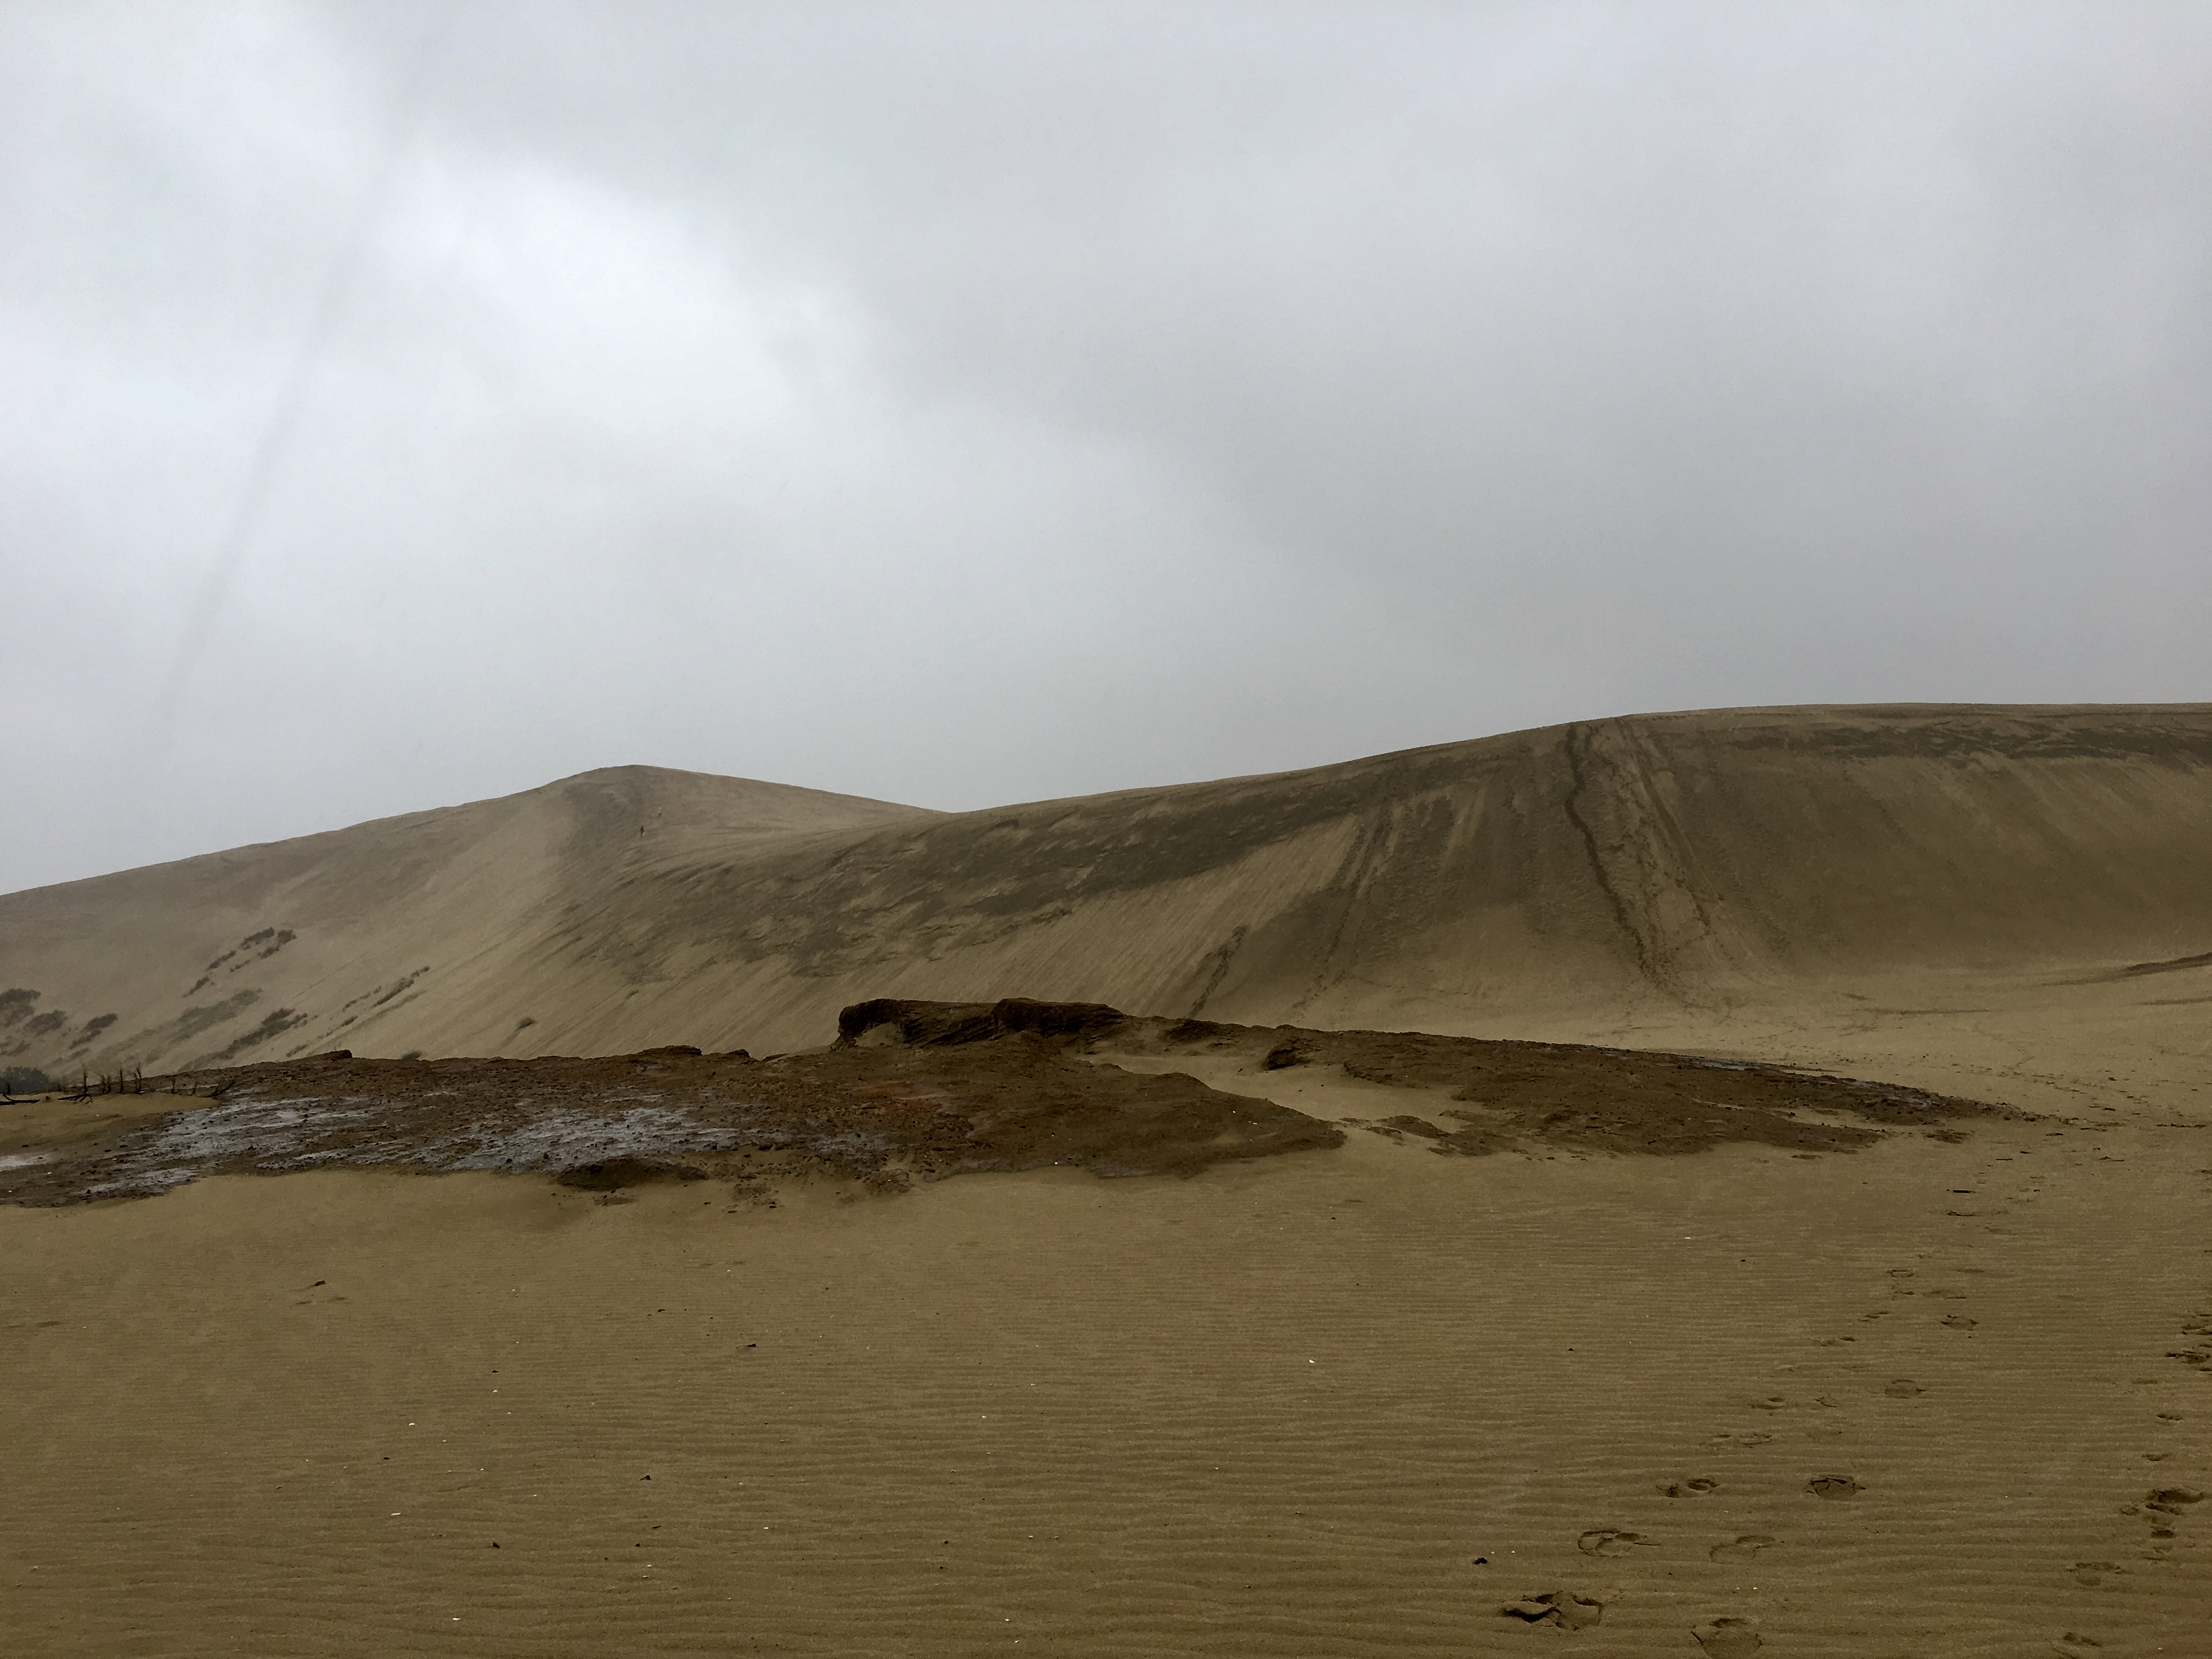 Giant Sand Dunes, Cape Reinga